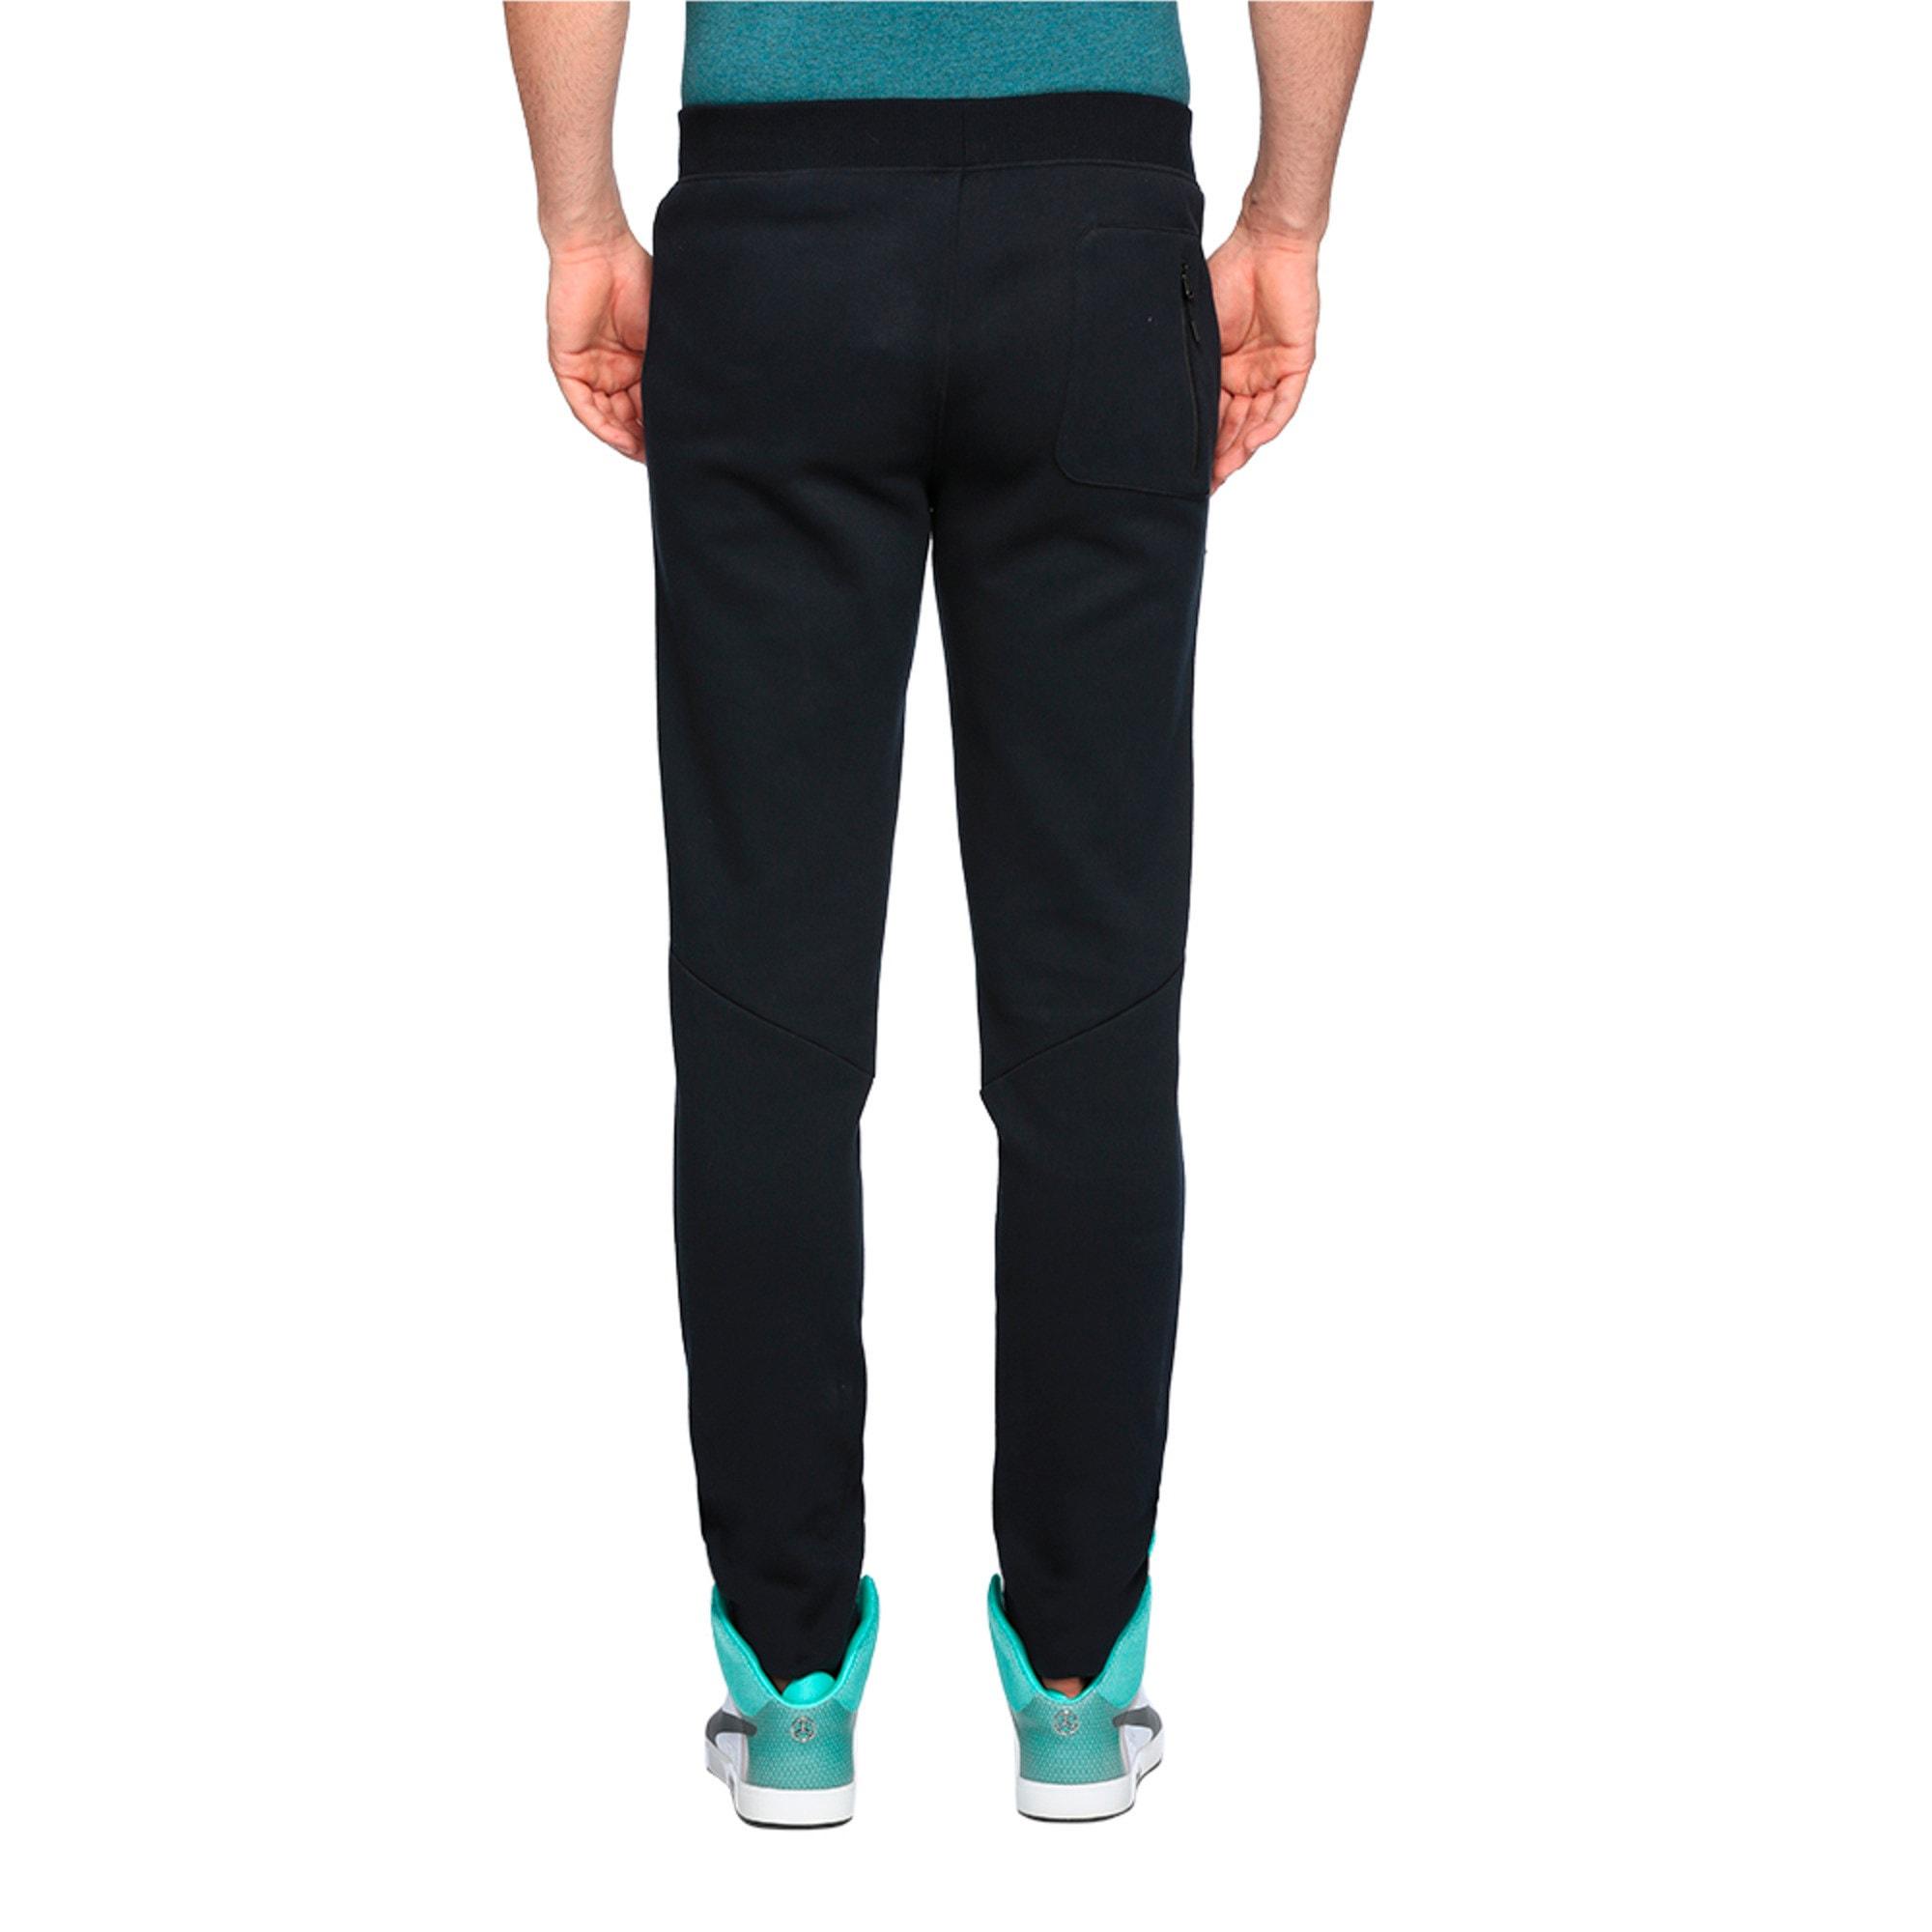 Thumbnail 3 of MERCEDES AMG PETRONAS Men's Sweatpants, Puma Black, medium-IND